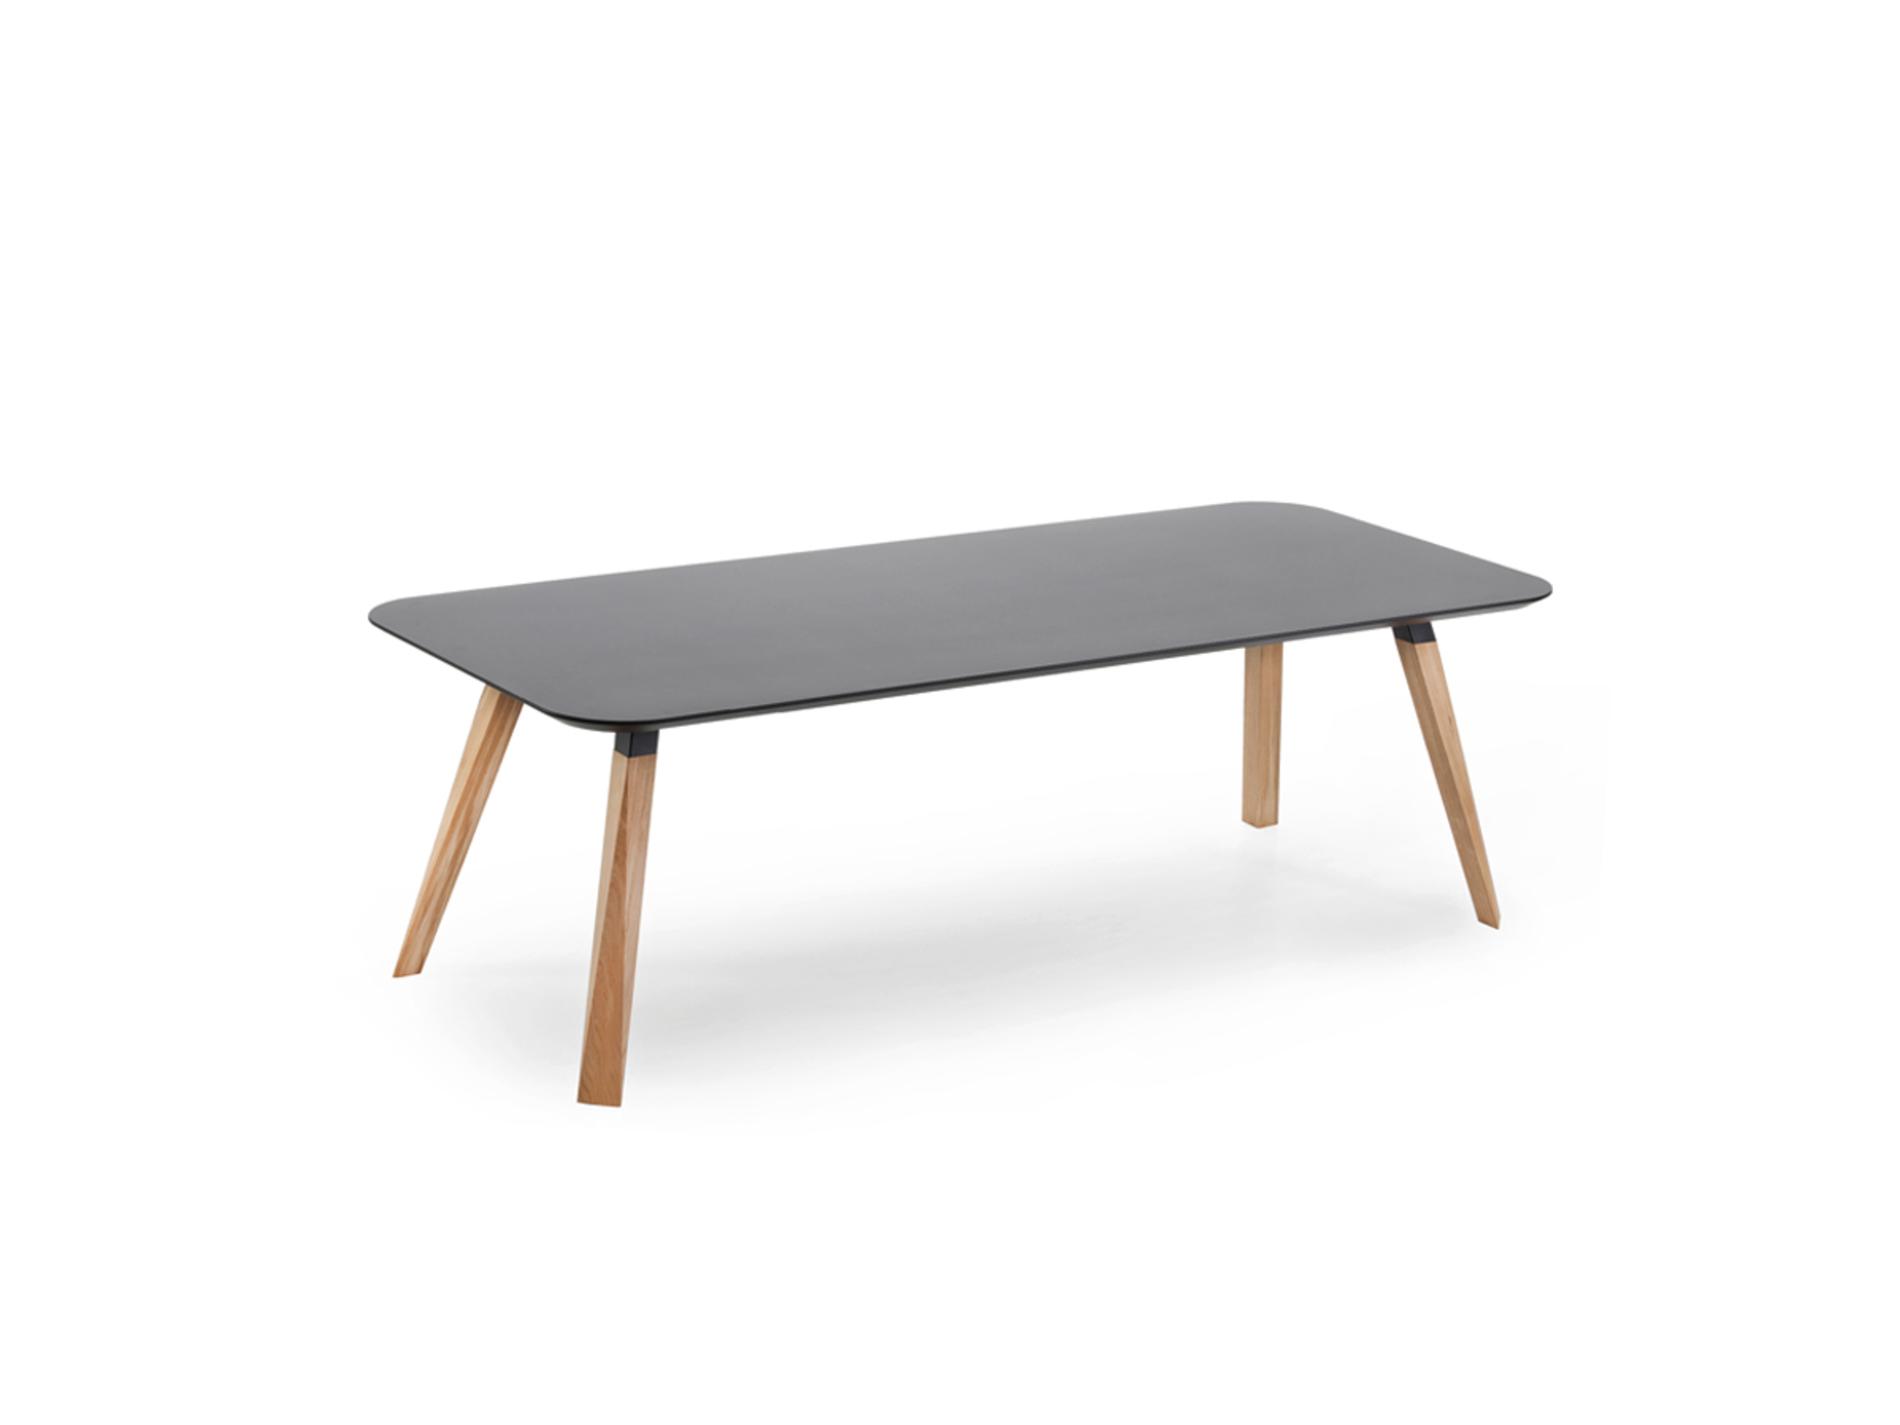 Tisch oblique prostoria 07